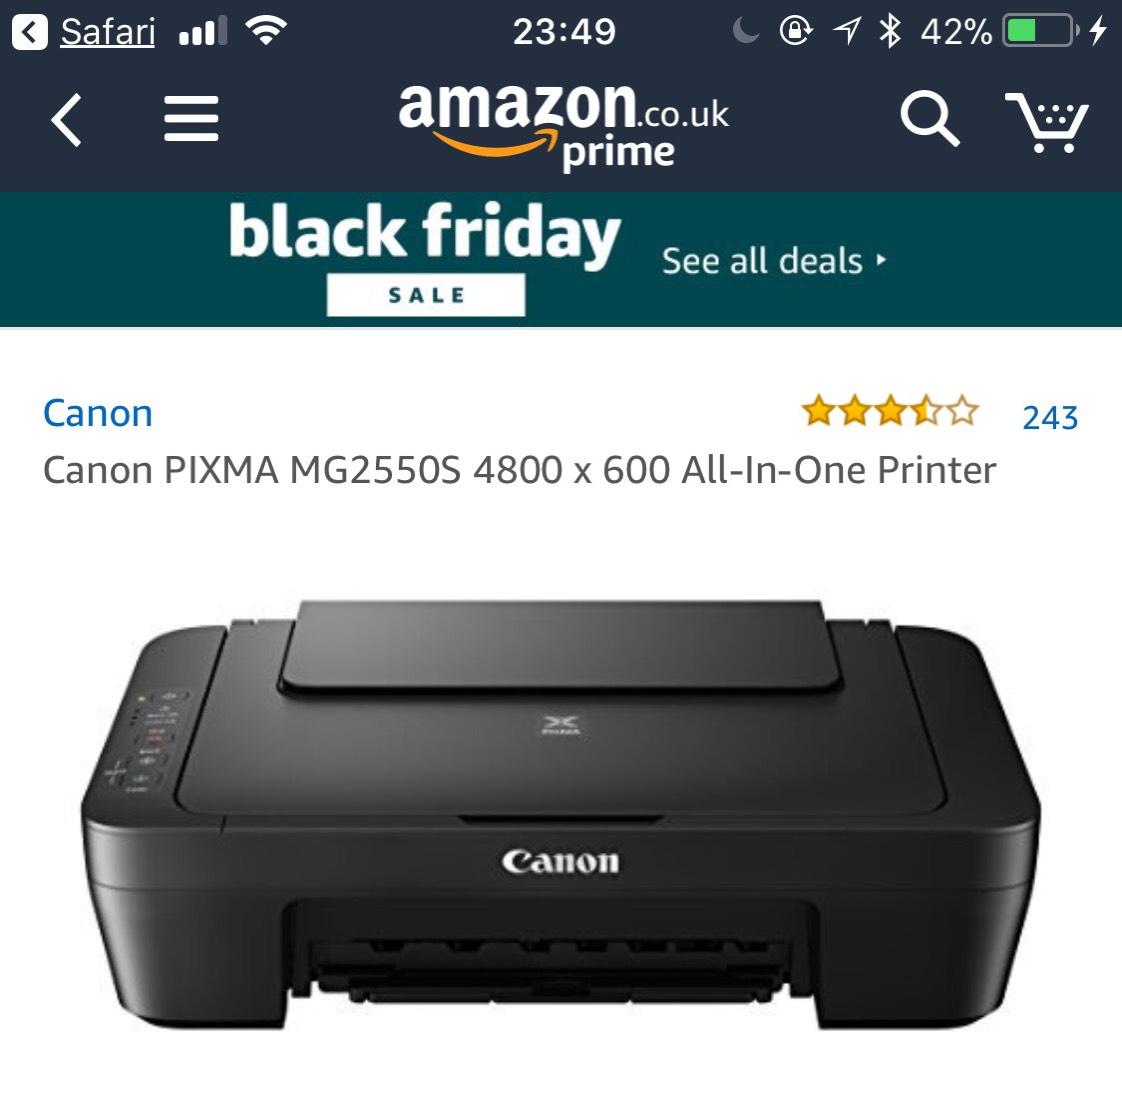 Canon PIXMA MG2550S 4800 x 600 All-In-One Printer @ Amazon prime  was £44.99 now £19.98